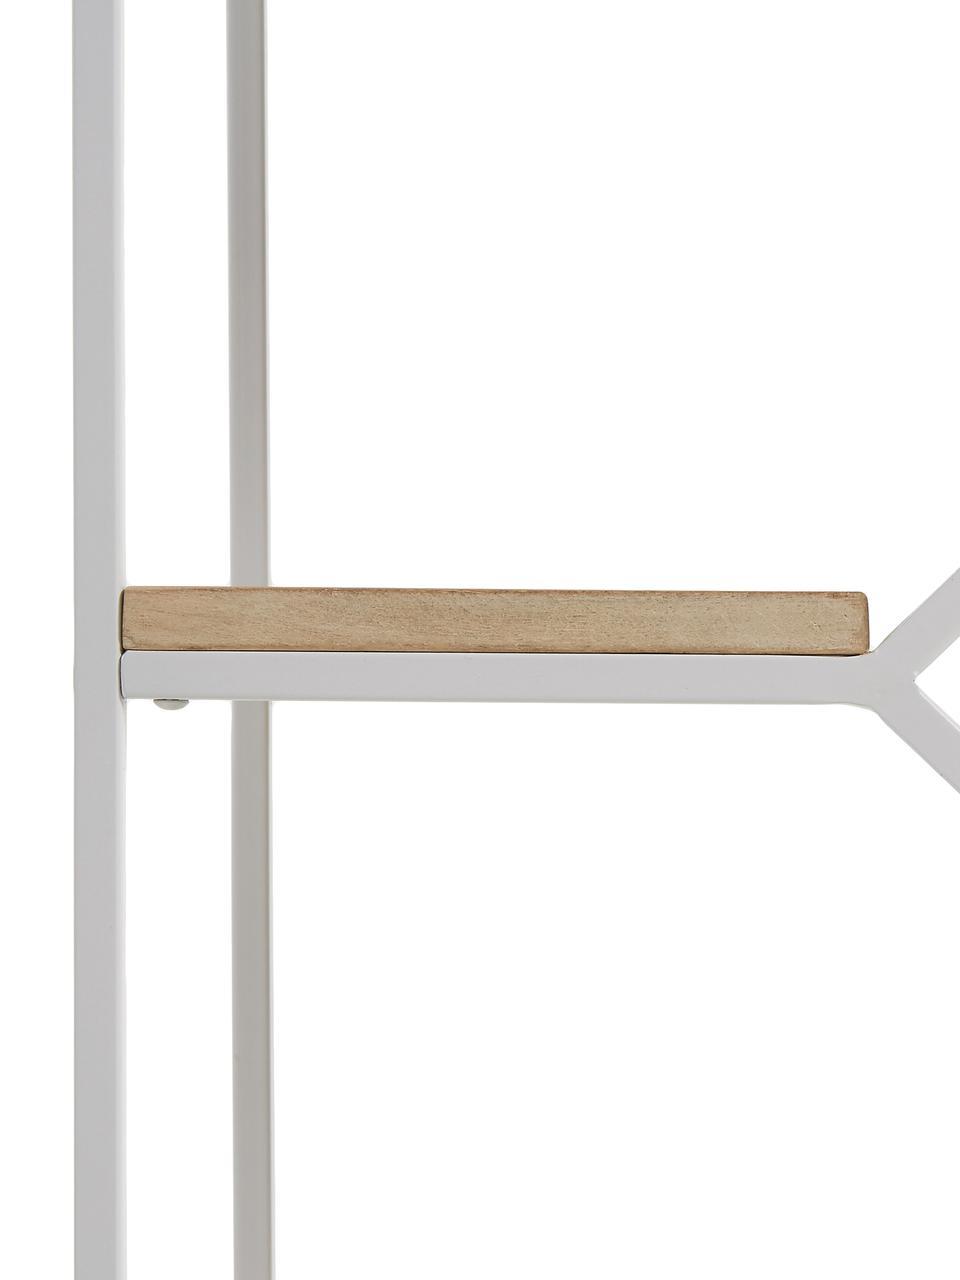 Standregal Push aus Holz und Metall, Gestell: Metall, lackiert, Weiß, Braun, 80 x 94 cm